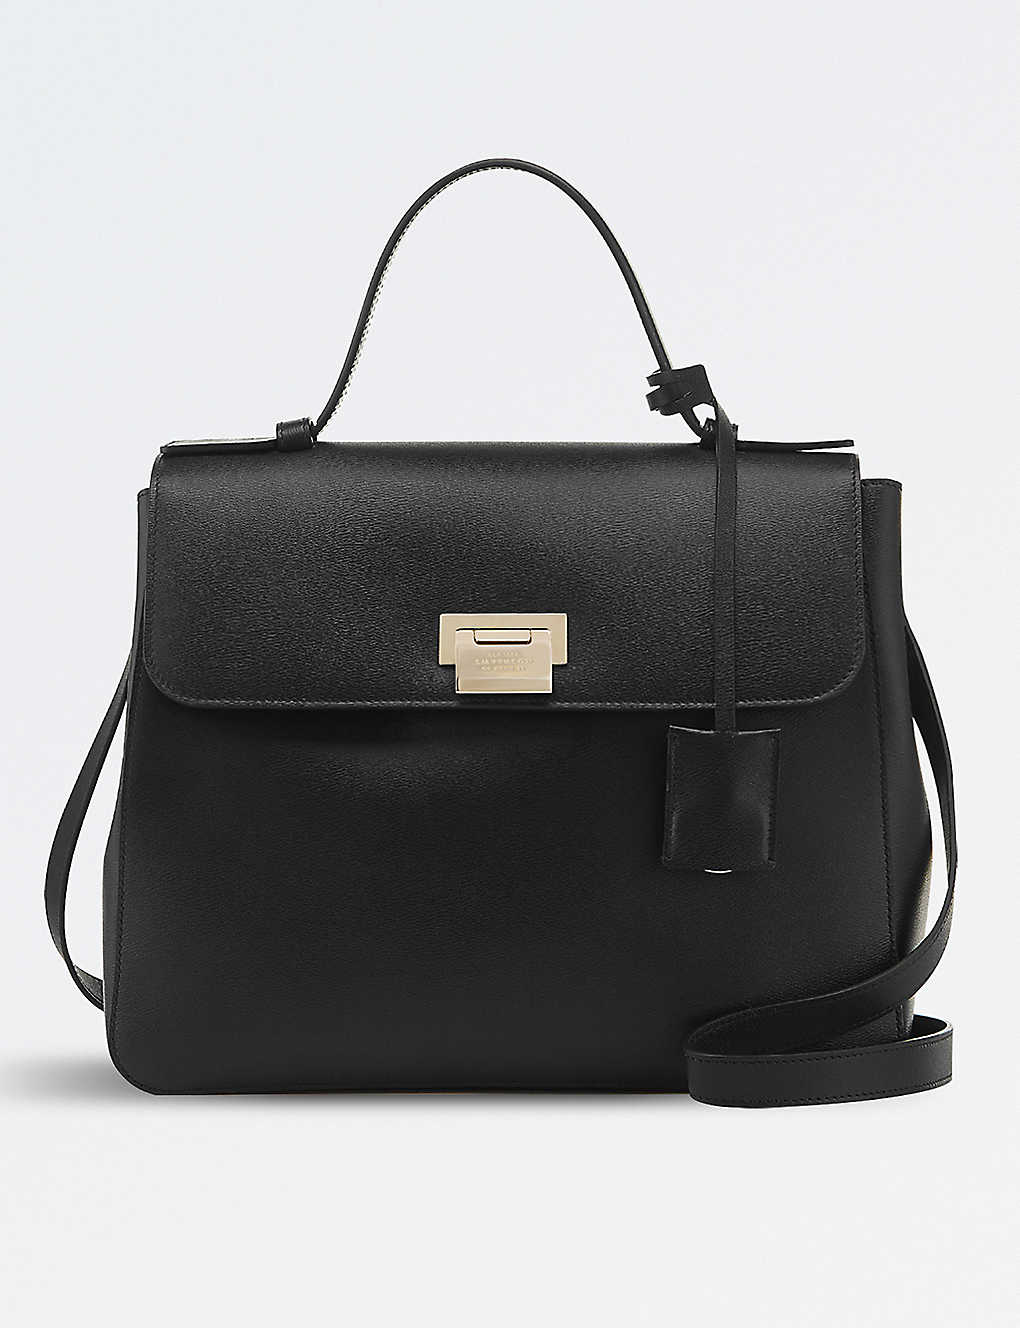 9b12851b9a9 SMYTHSON - Grosvenor top handle leather bag   Selfridges.com